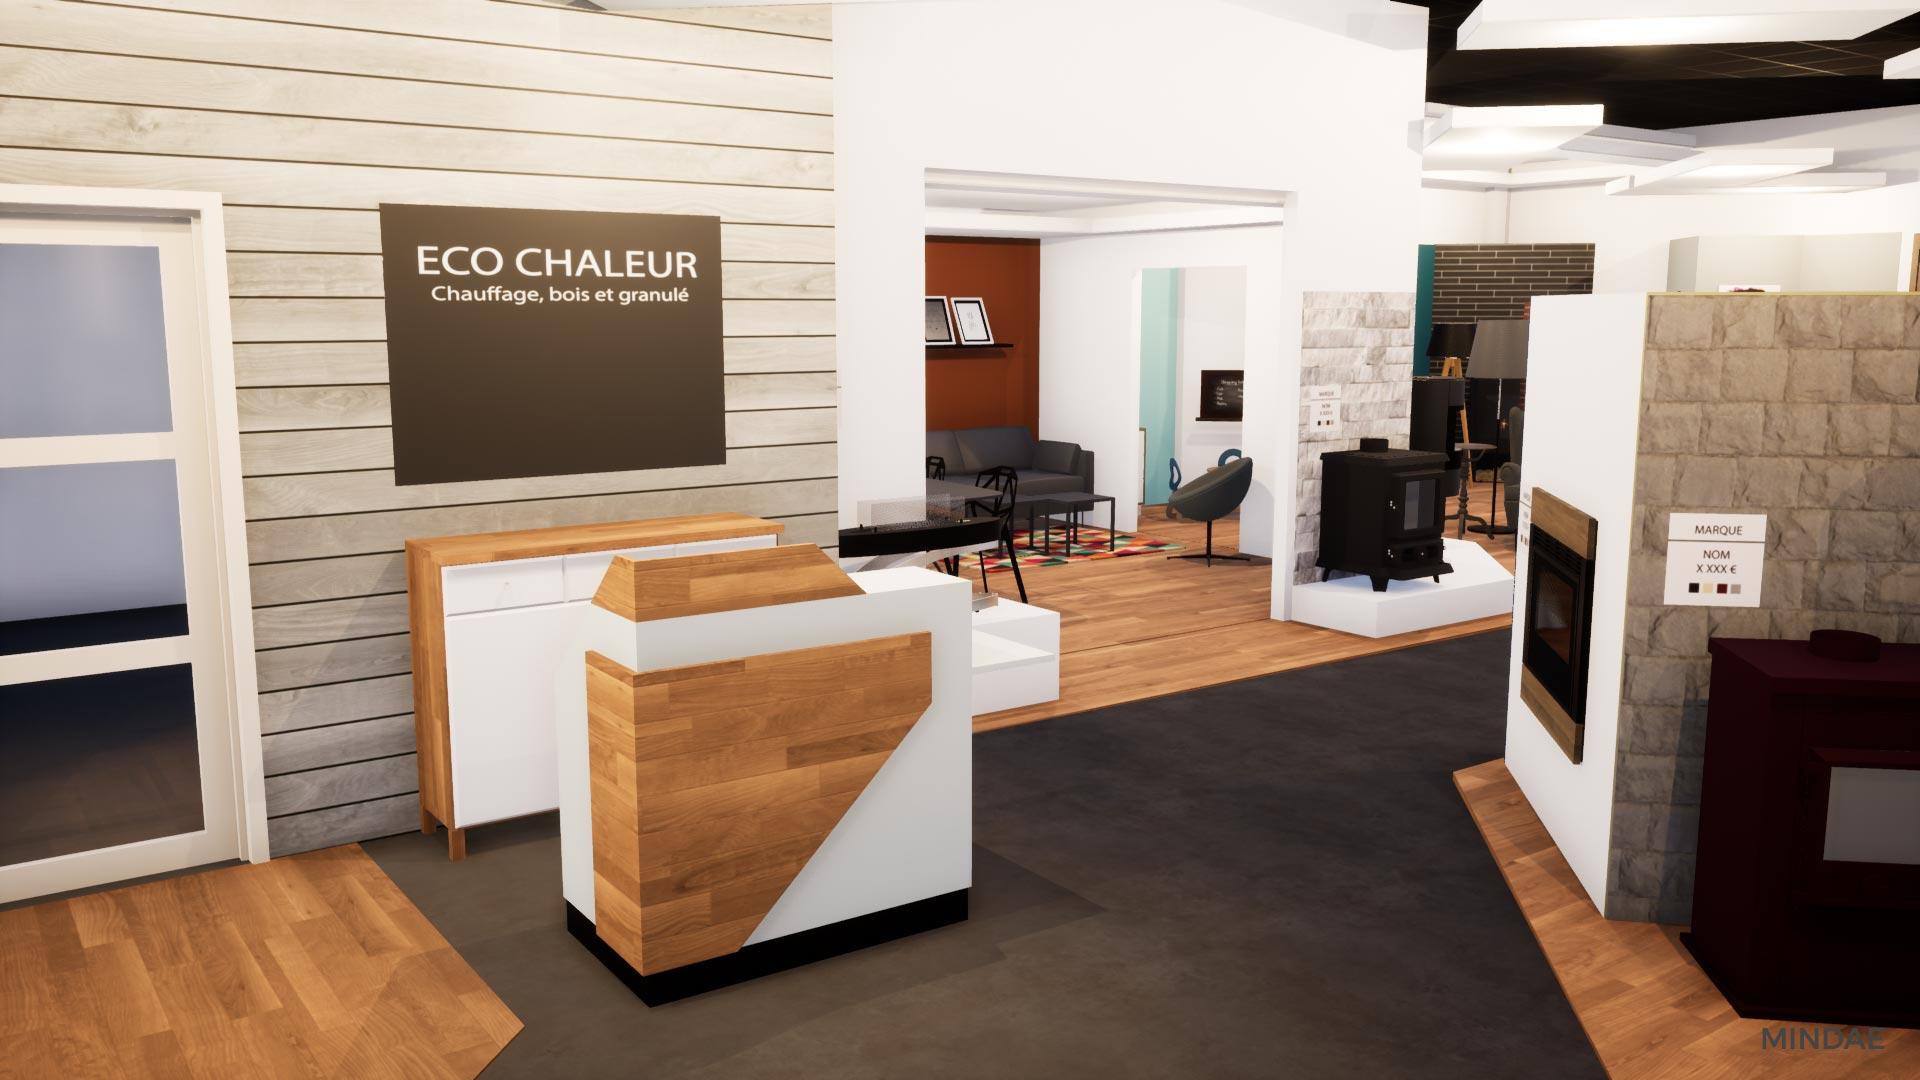 Mindae_3D_projet_agencement_poele_bois_cheminee_showroom_flamdesign_magasin_mondeville-(6)